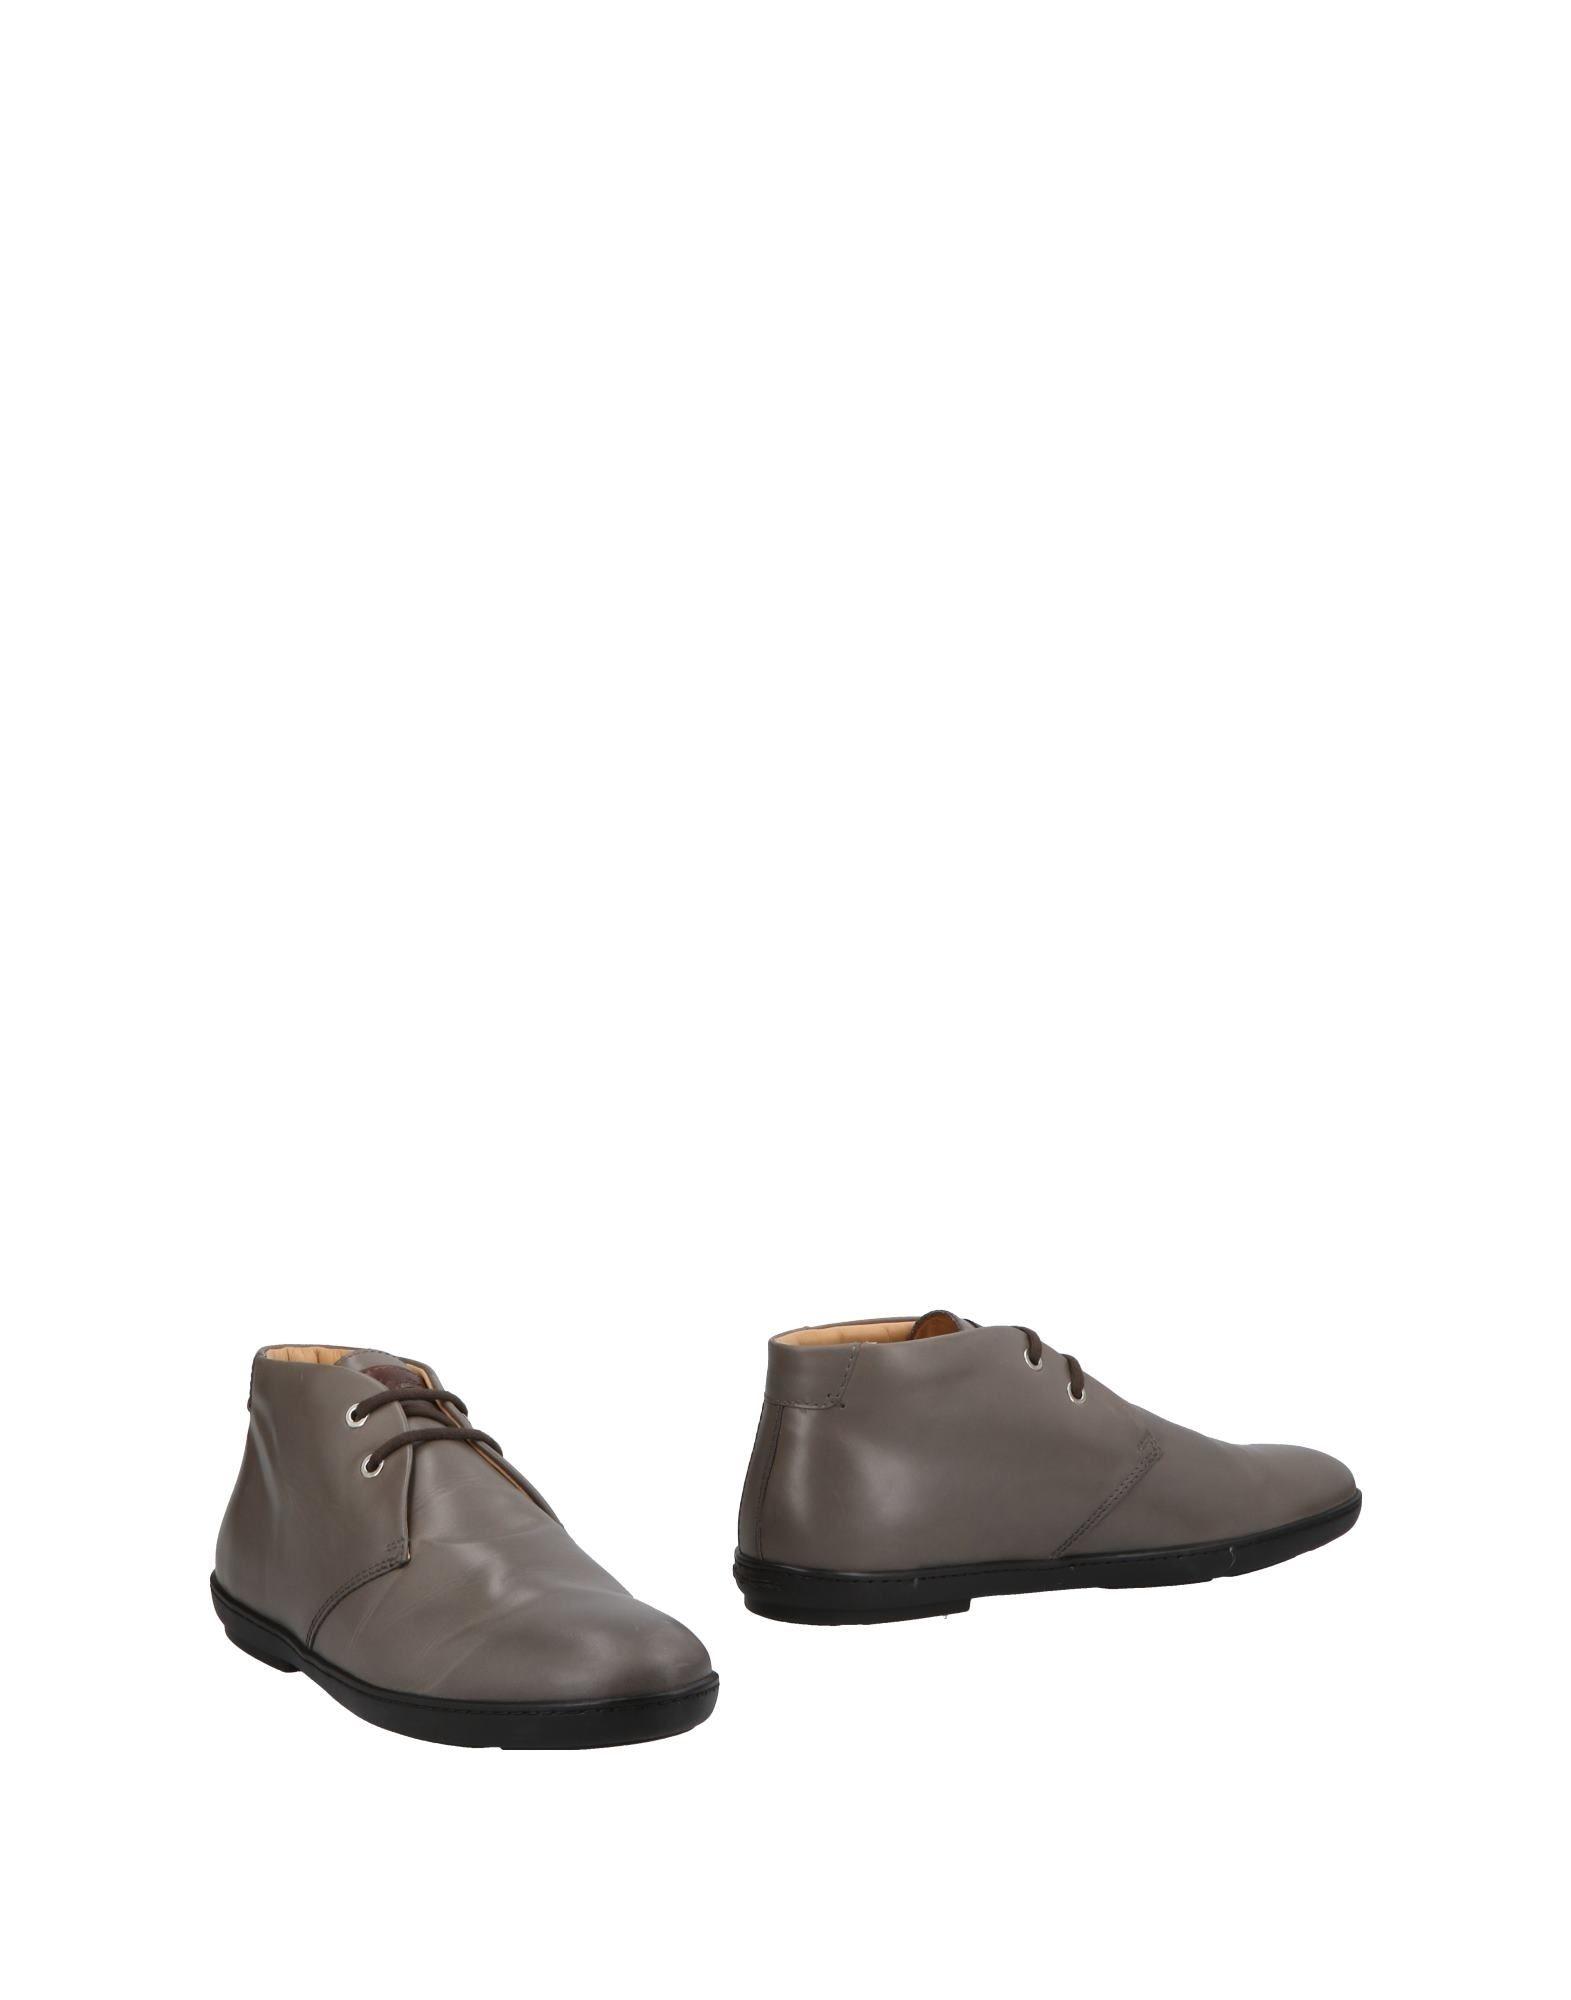 Santoni Boots - Australia Men Santoni Boots online on  Australia - - 11487784QG 1d5b87